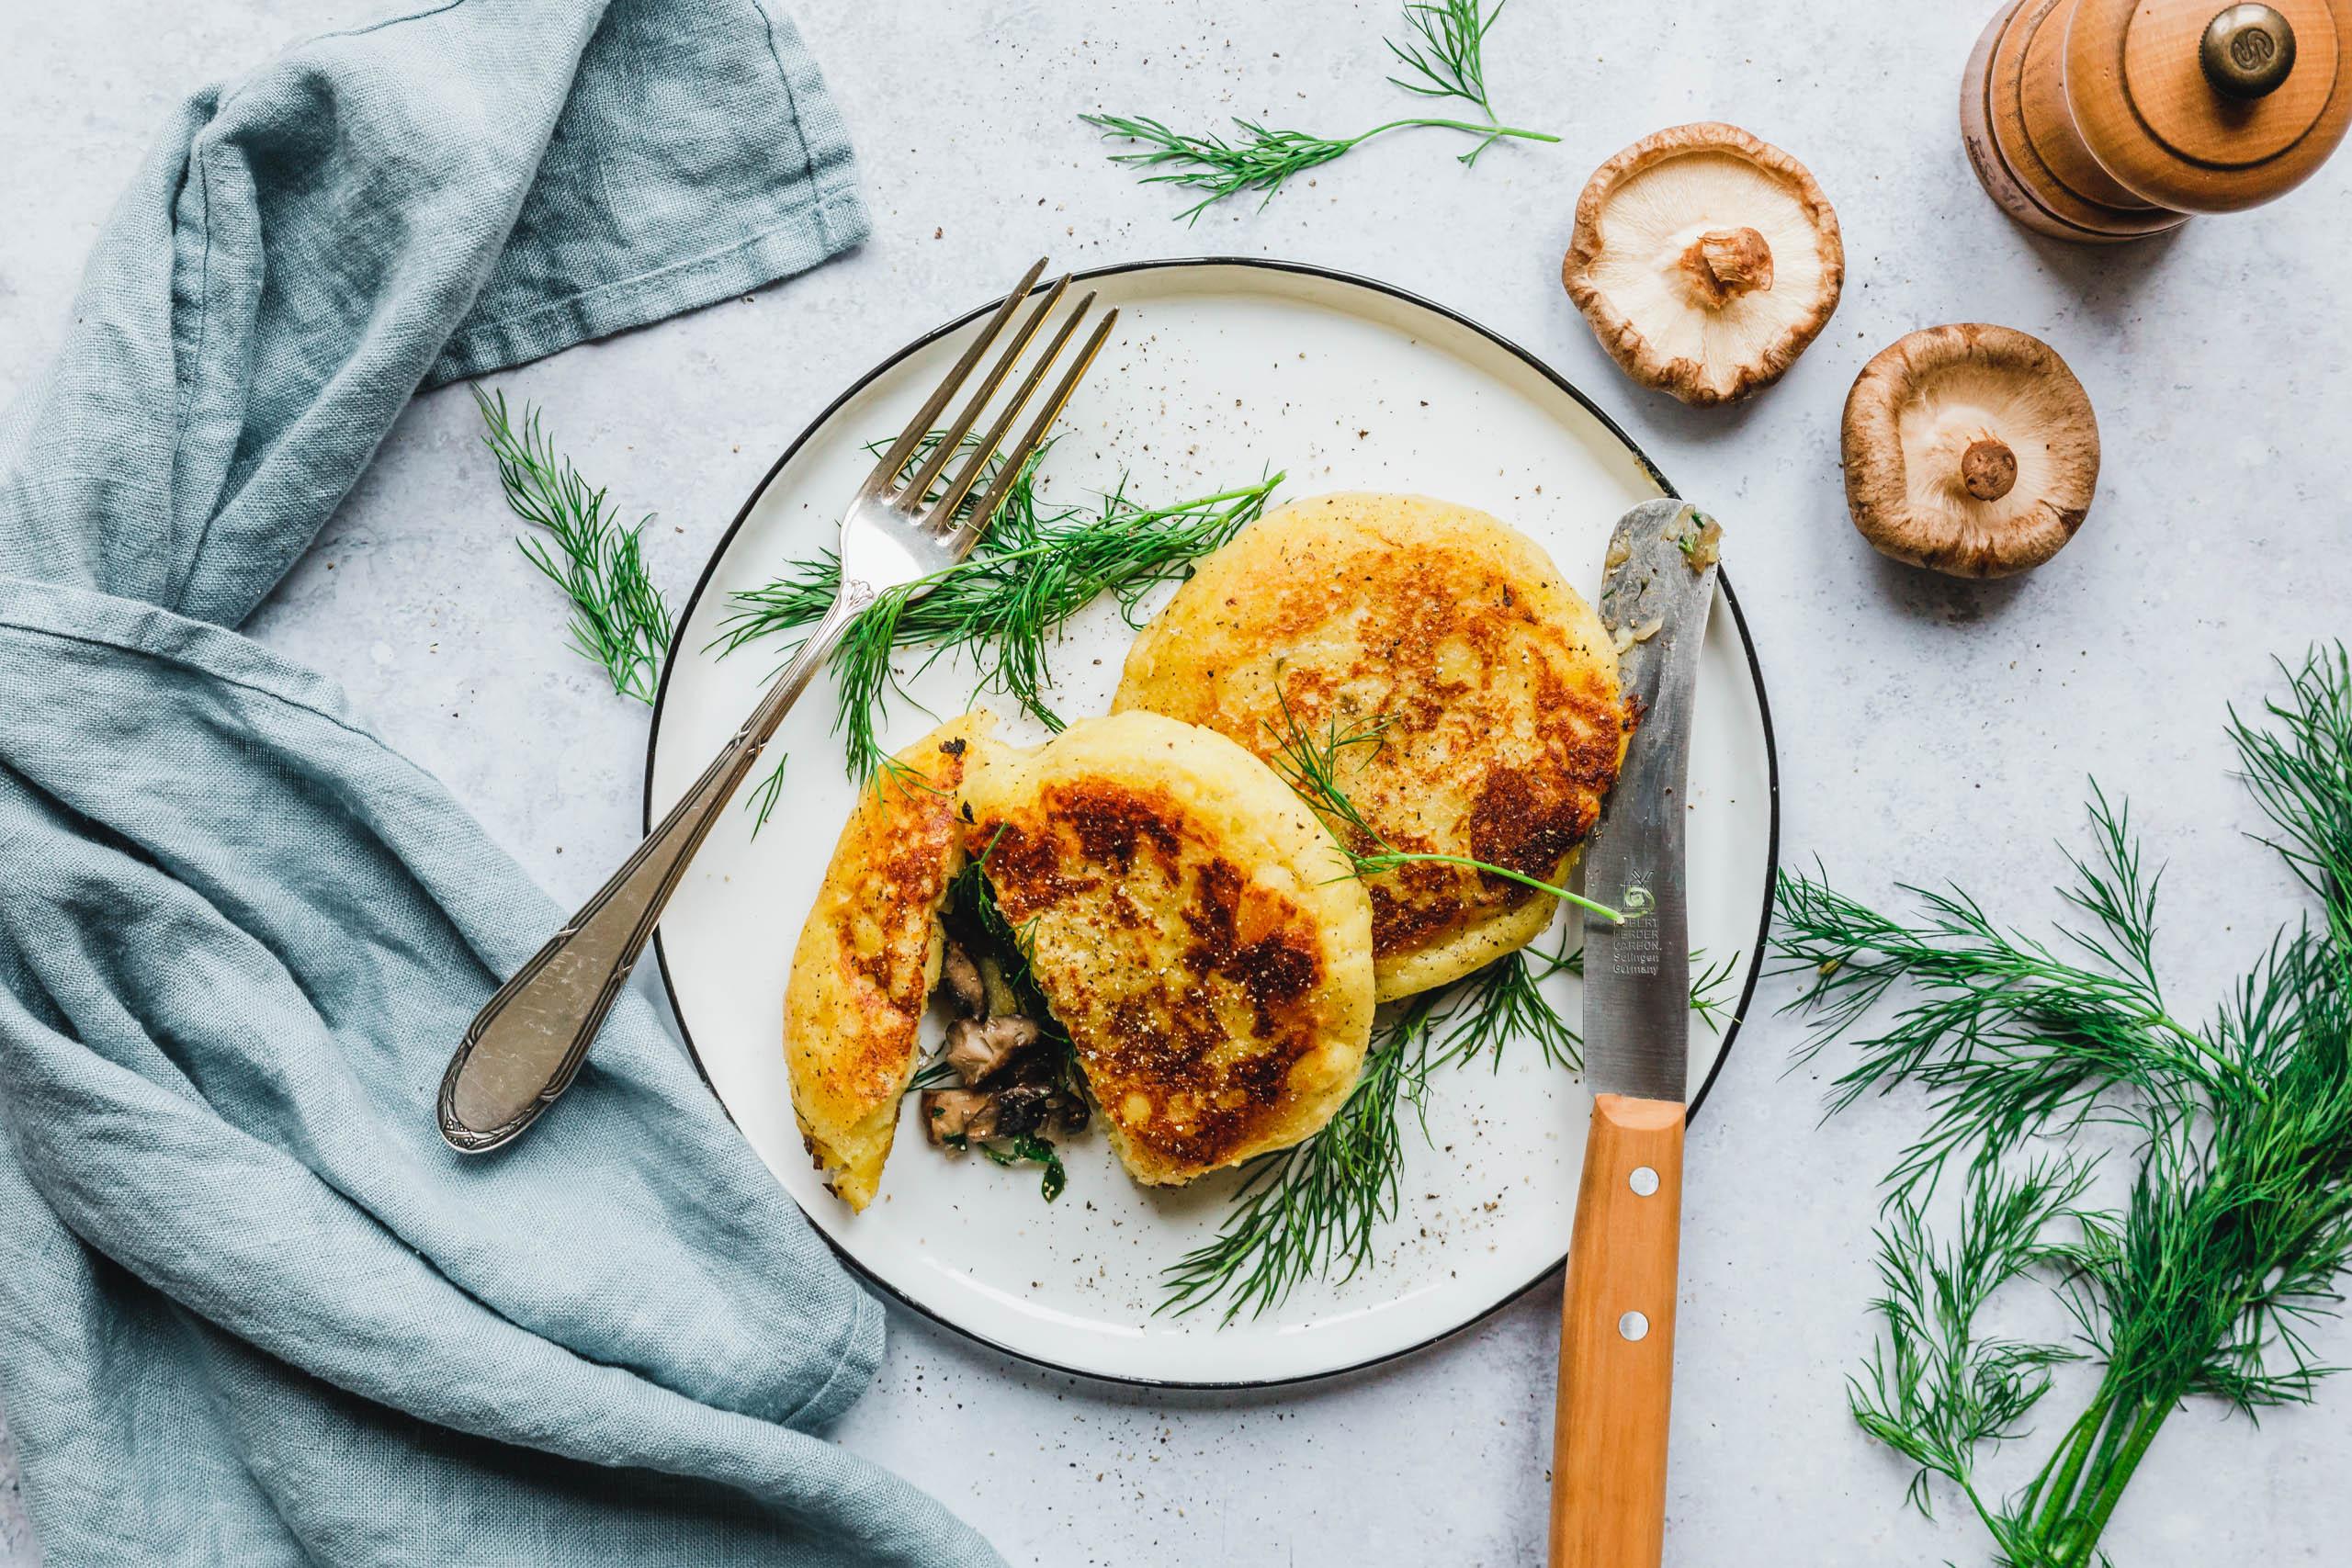 Knusprige Potato Cakes mit Pilzfüllung & frischem Dill